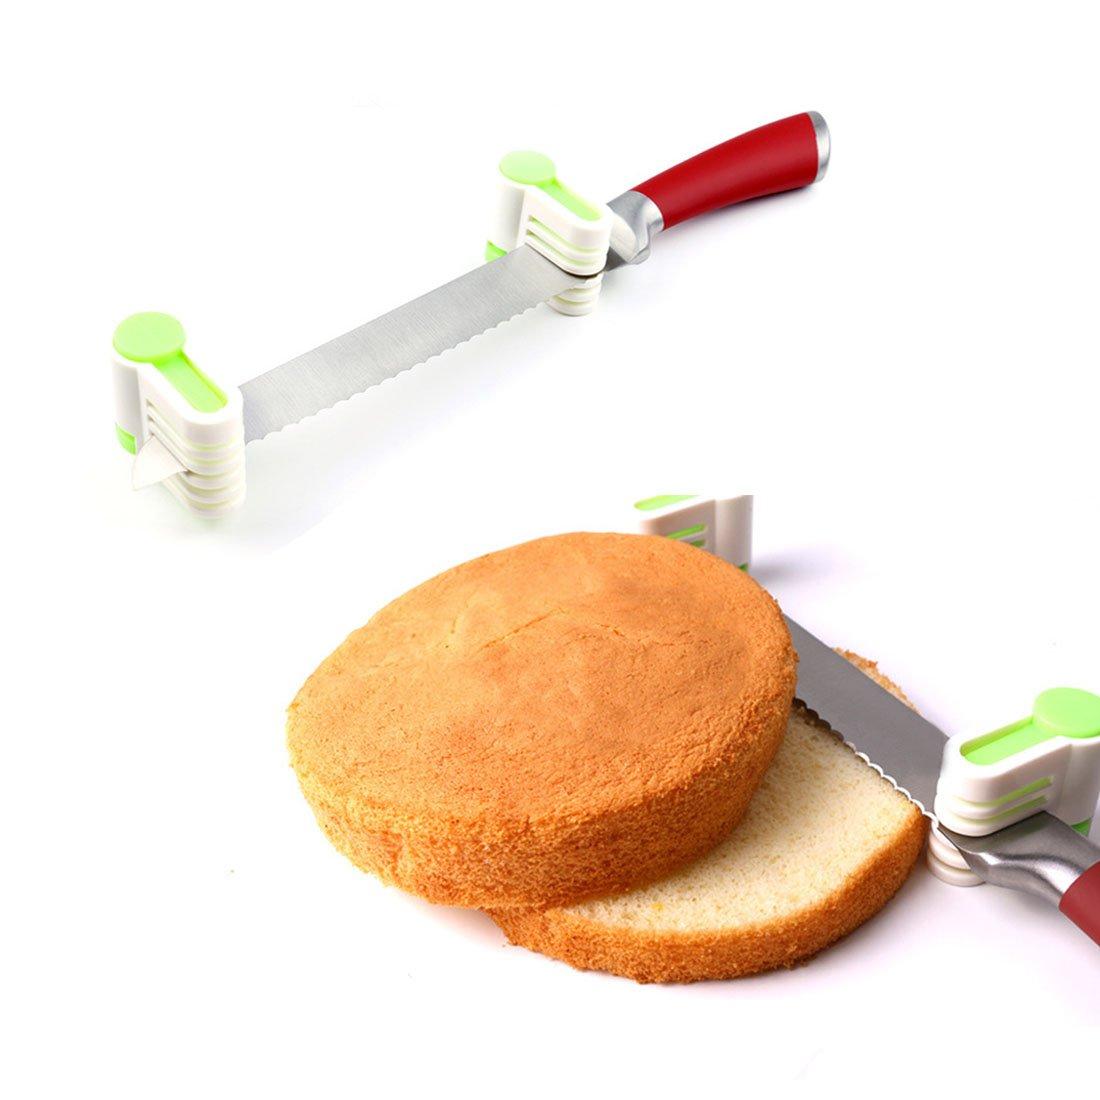 Joylive 2Pcs Bread Cutter Slicer Plastic Cake Baking Kitchen Tools - Random Color